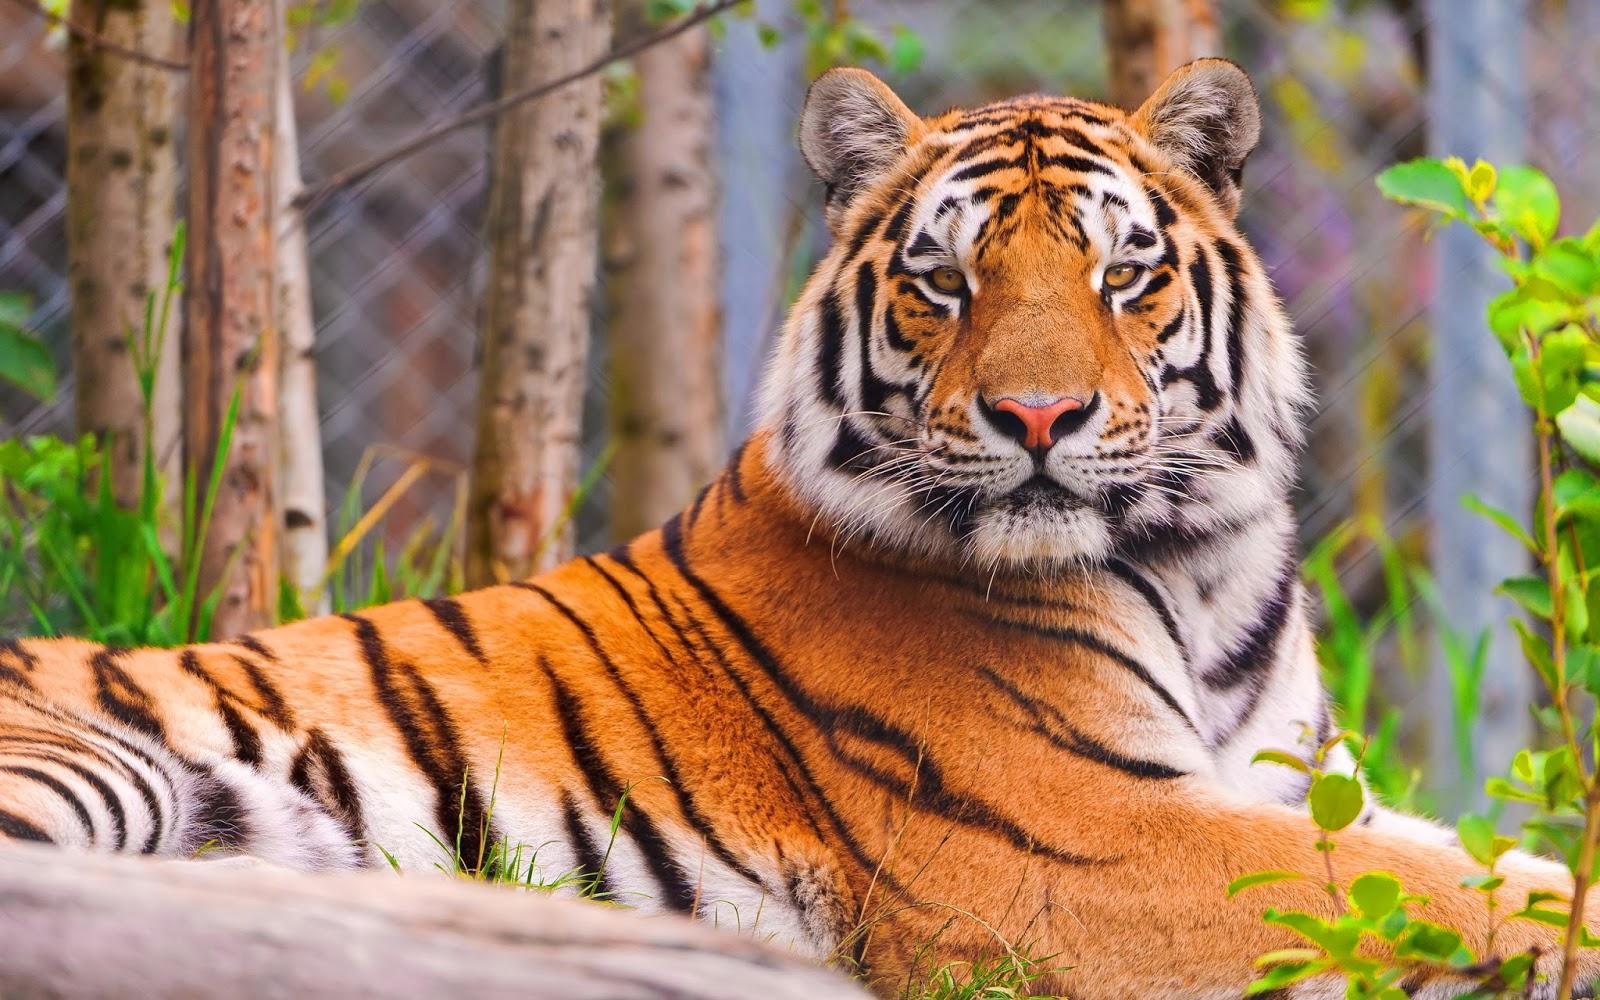 Hd Tiger Pictures Tiger Wallpapers: Beautiful Desktop Wallpapers 2014